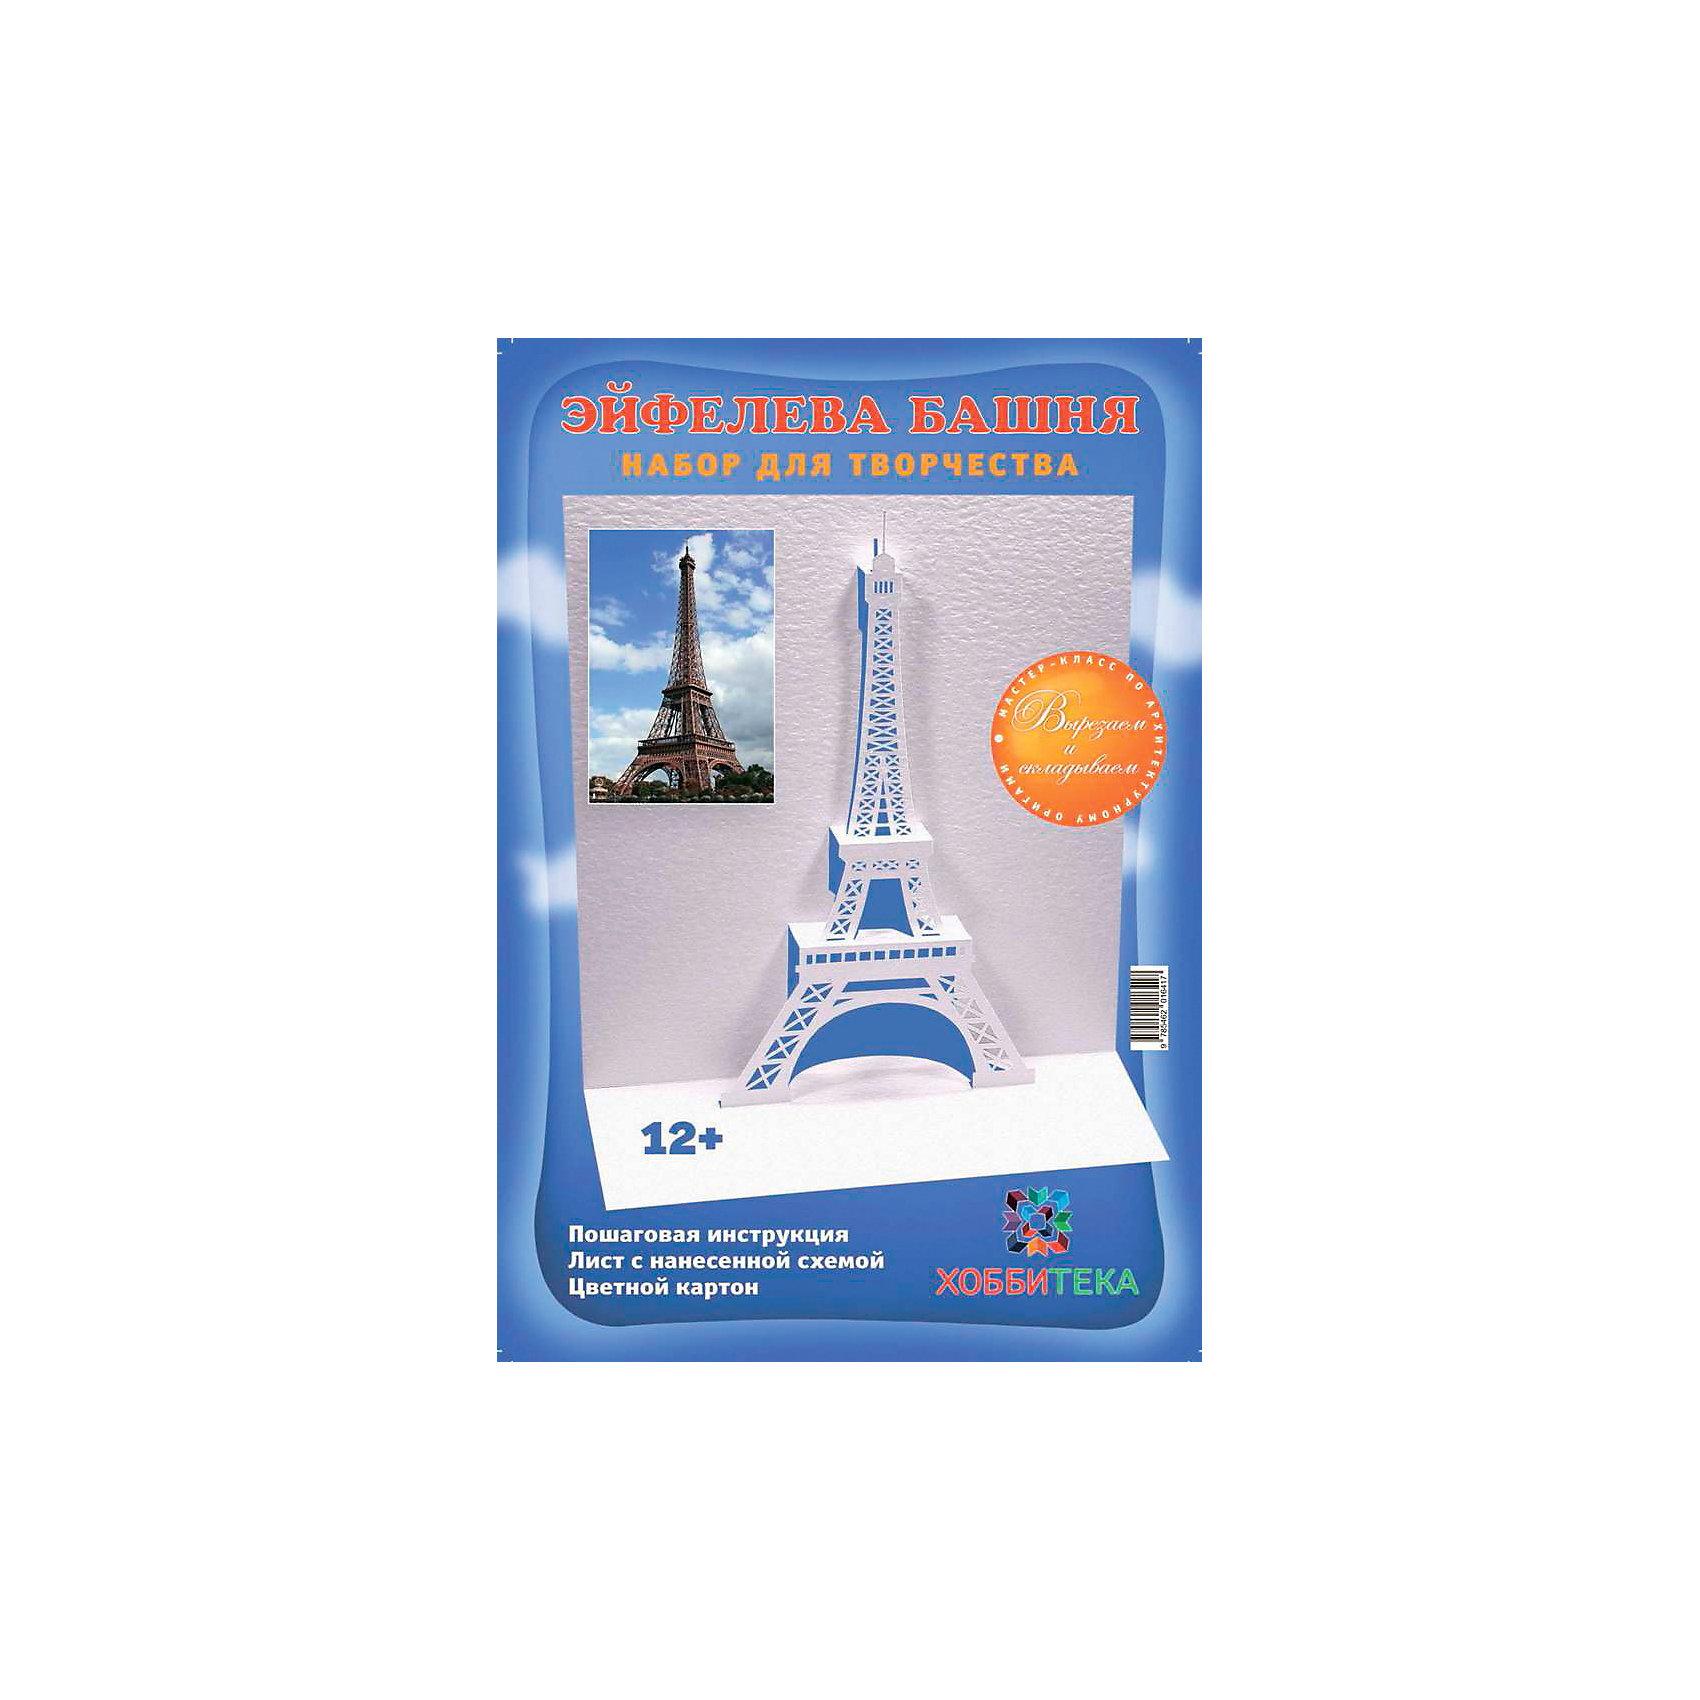 АСТ-ПРЕСС Архитектурное оригами. Эйфелева башня пазлы magic pazle объемный 3d пазл эйфелева башня 78x38x35 см